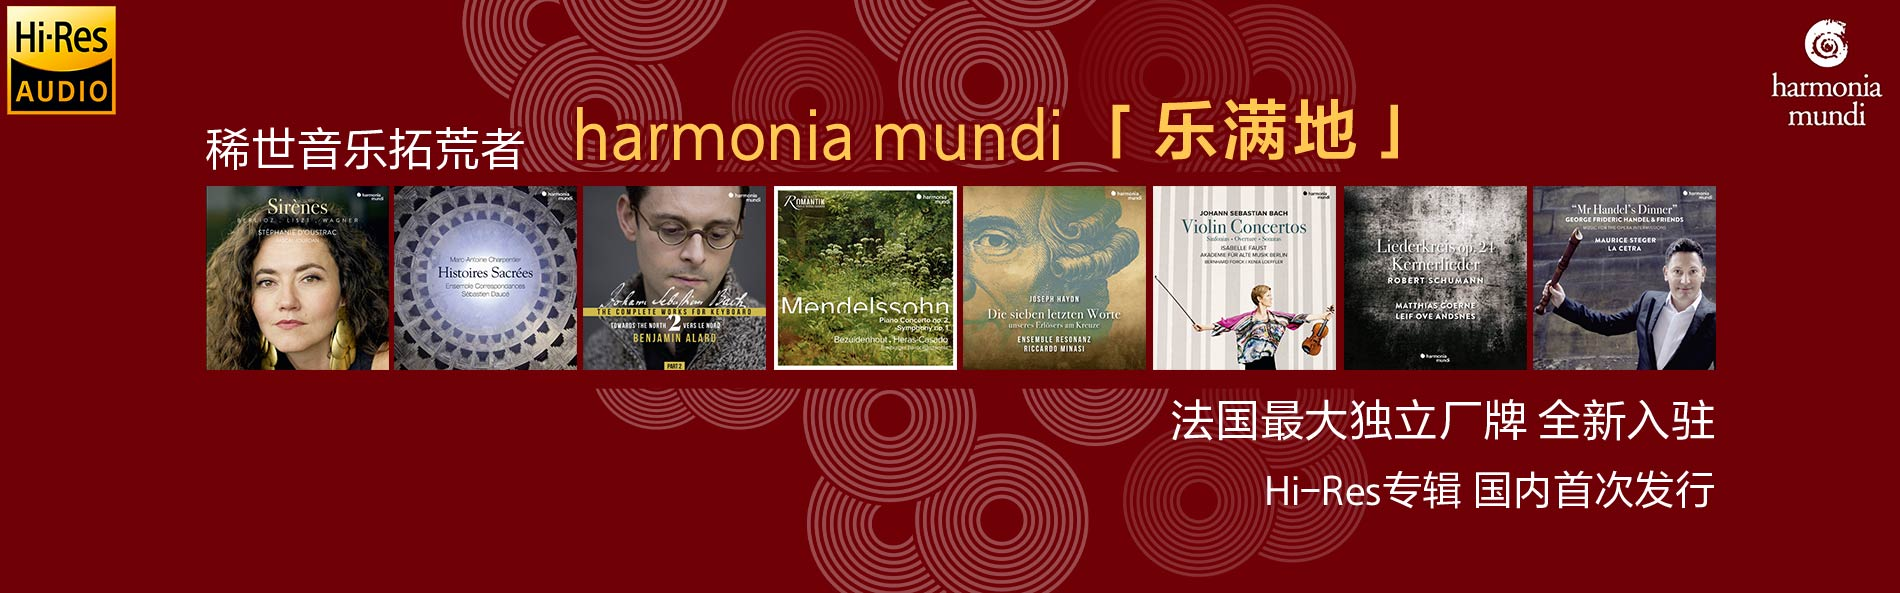 harmoniamundi190510